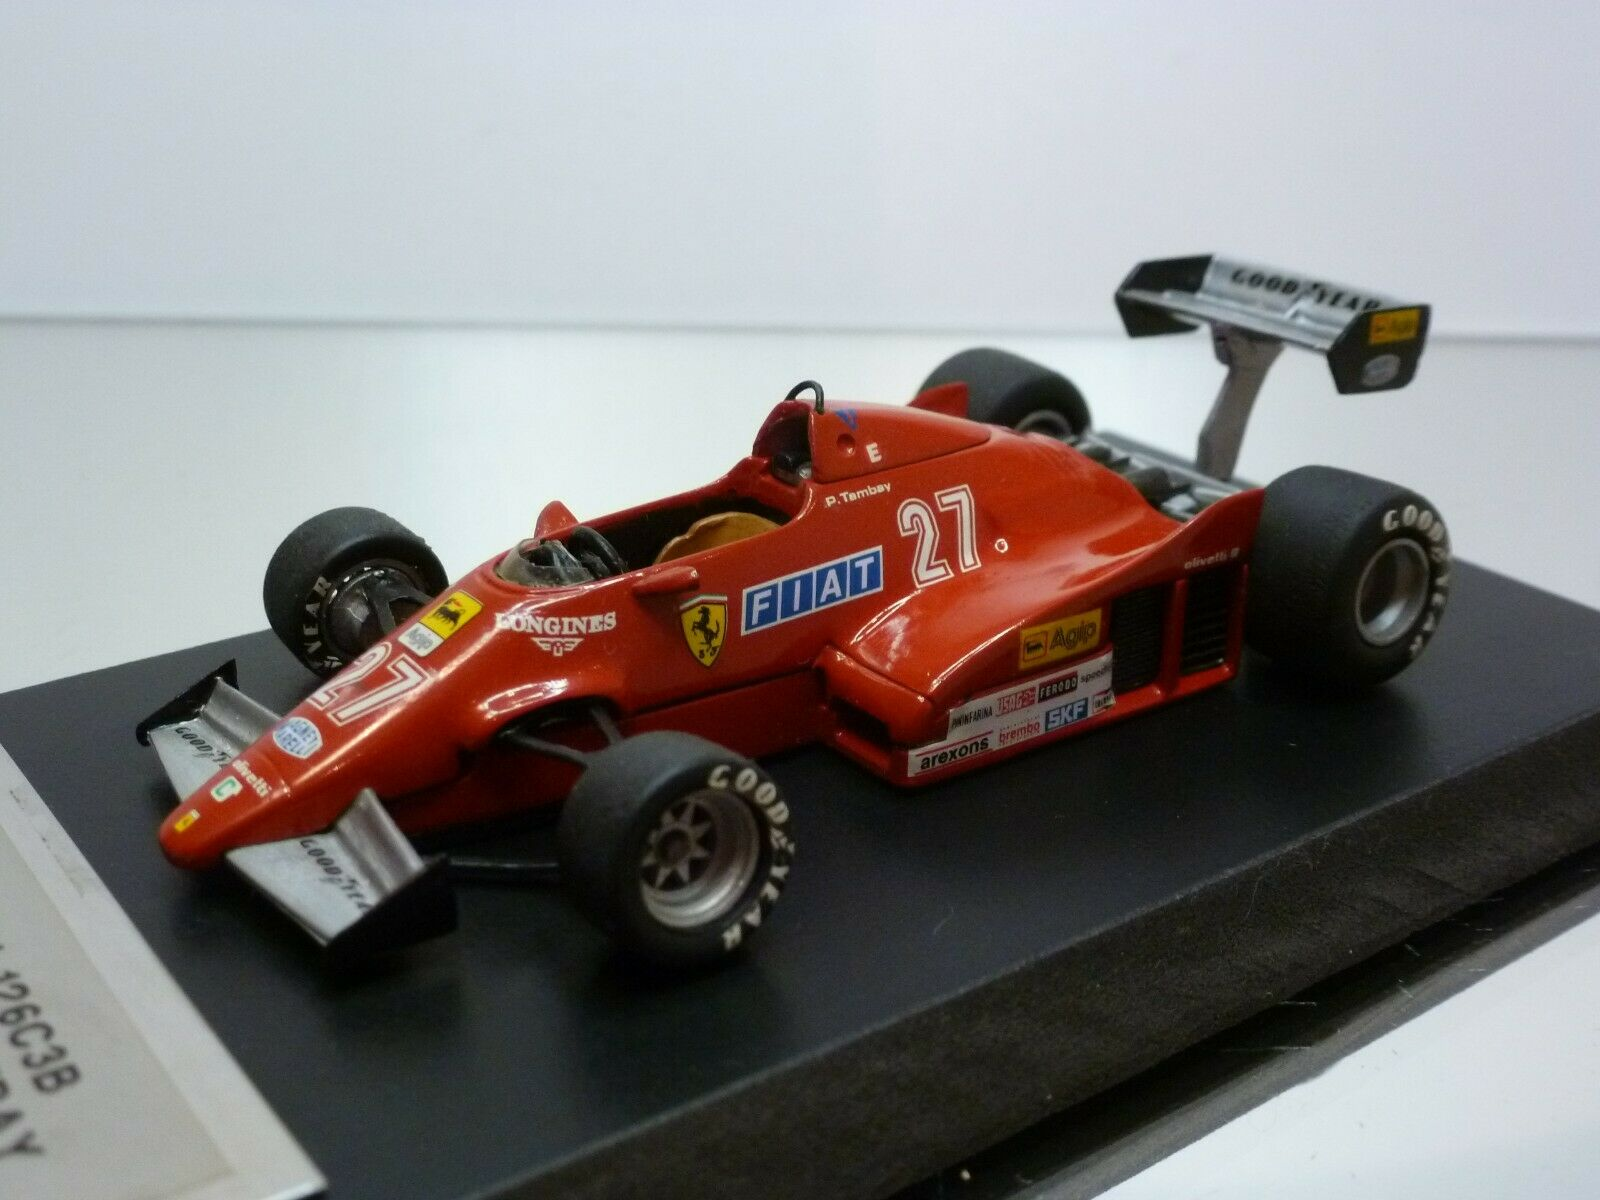 HIFI FERRARI 126C3B  - GP ITALY '83 - TAMBAY  27- F1 rouge 1 43 - VERY GOOD on BASE  promotions d'équipe